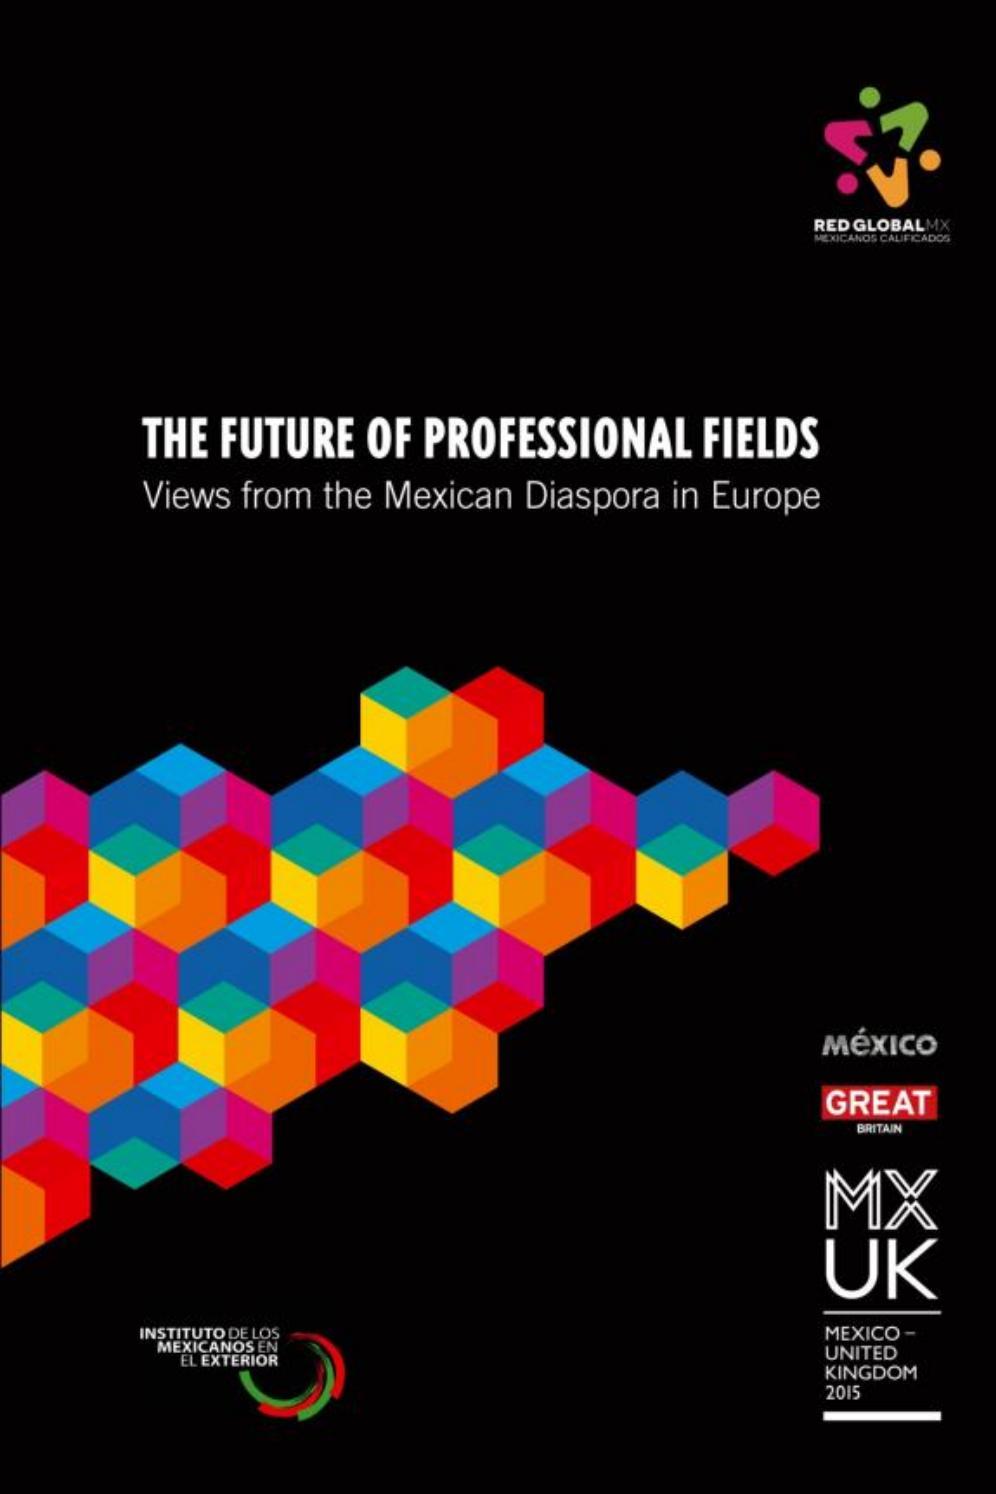 COLLABORATIVE BOOK - The Future of Professional Fields